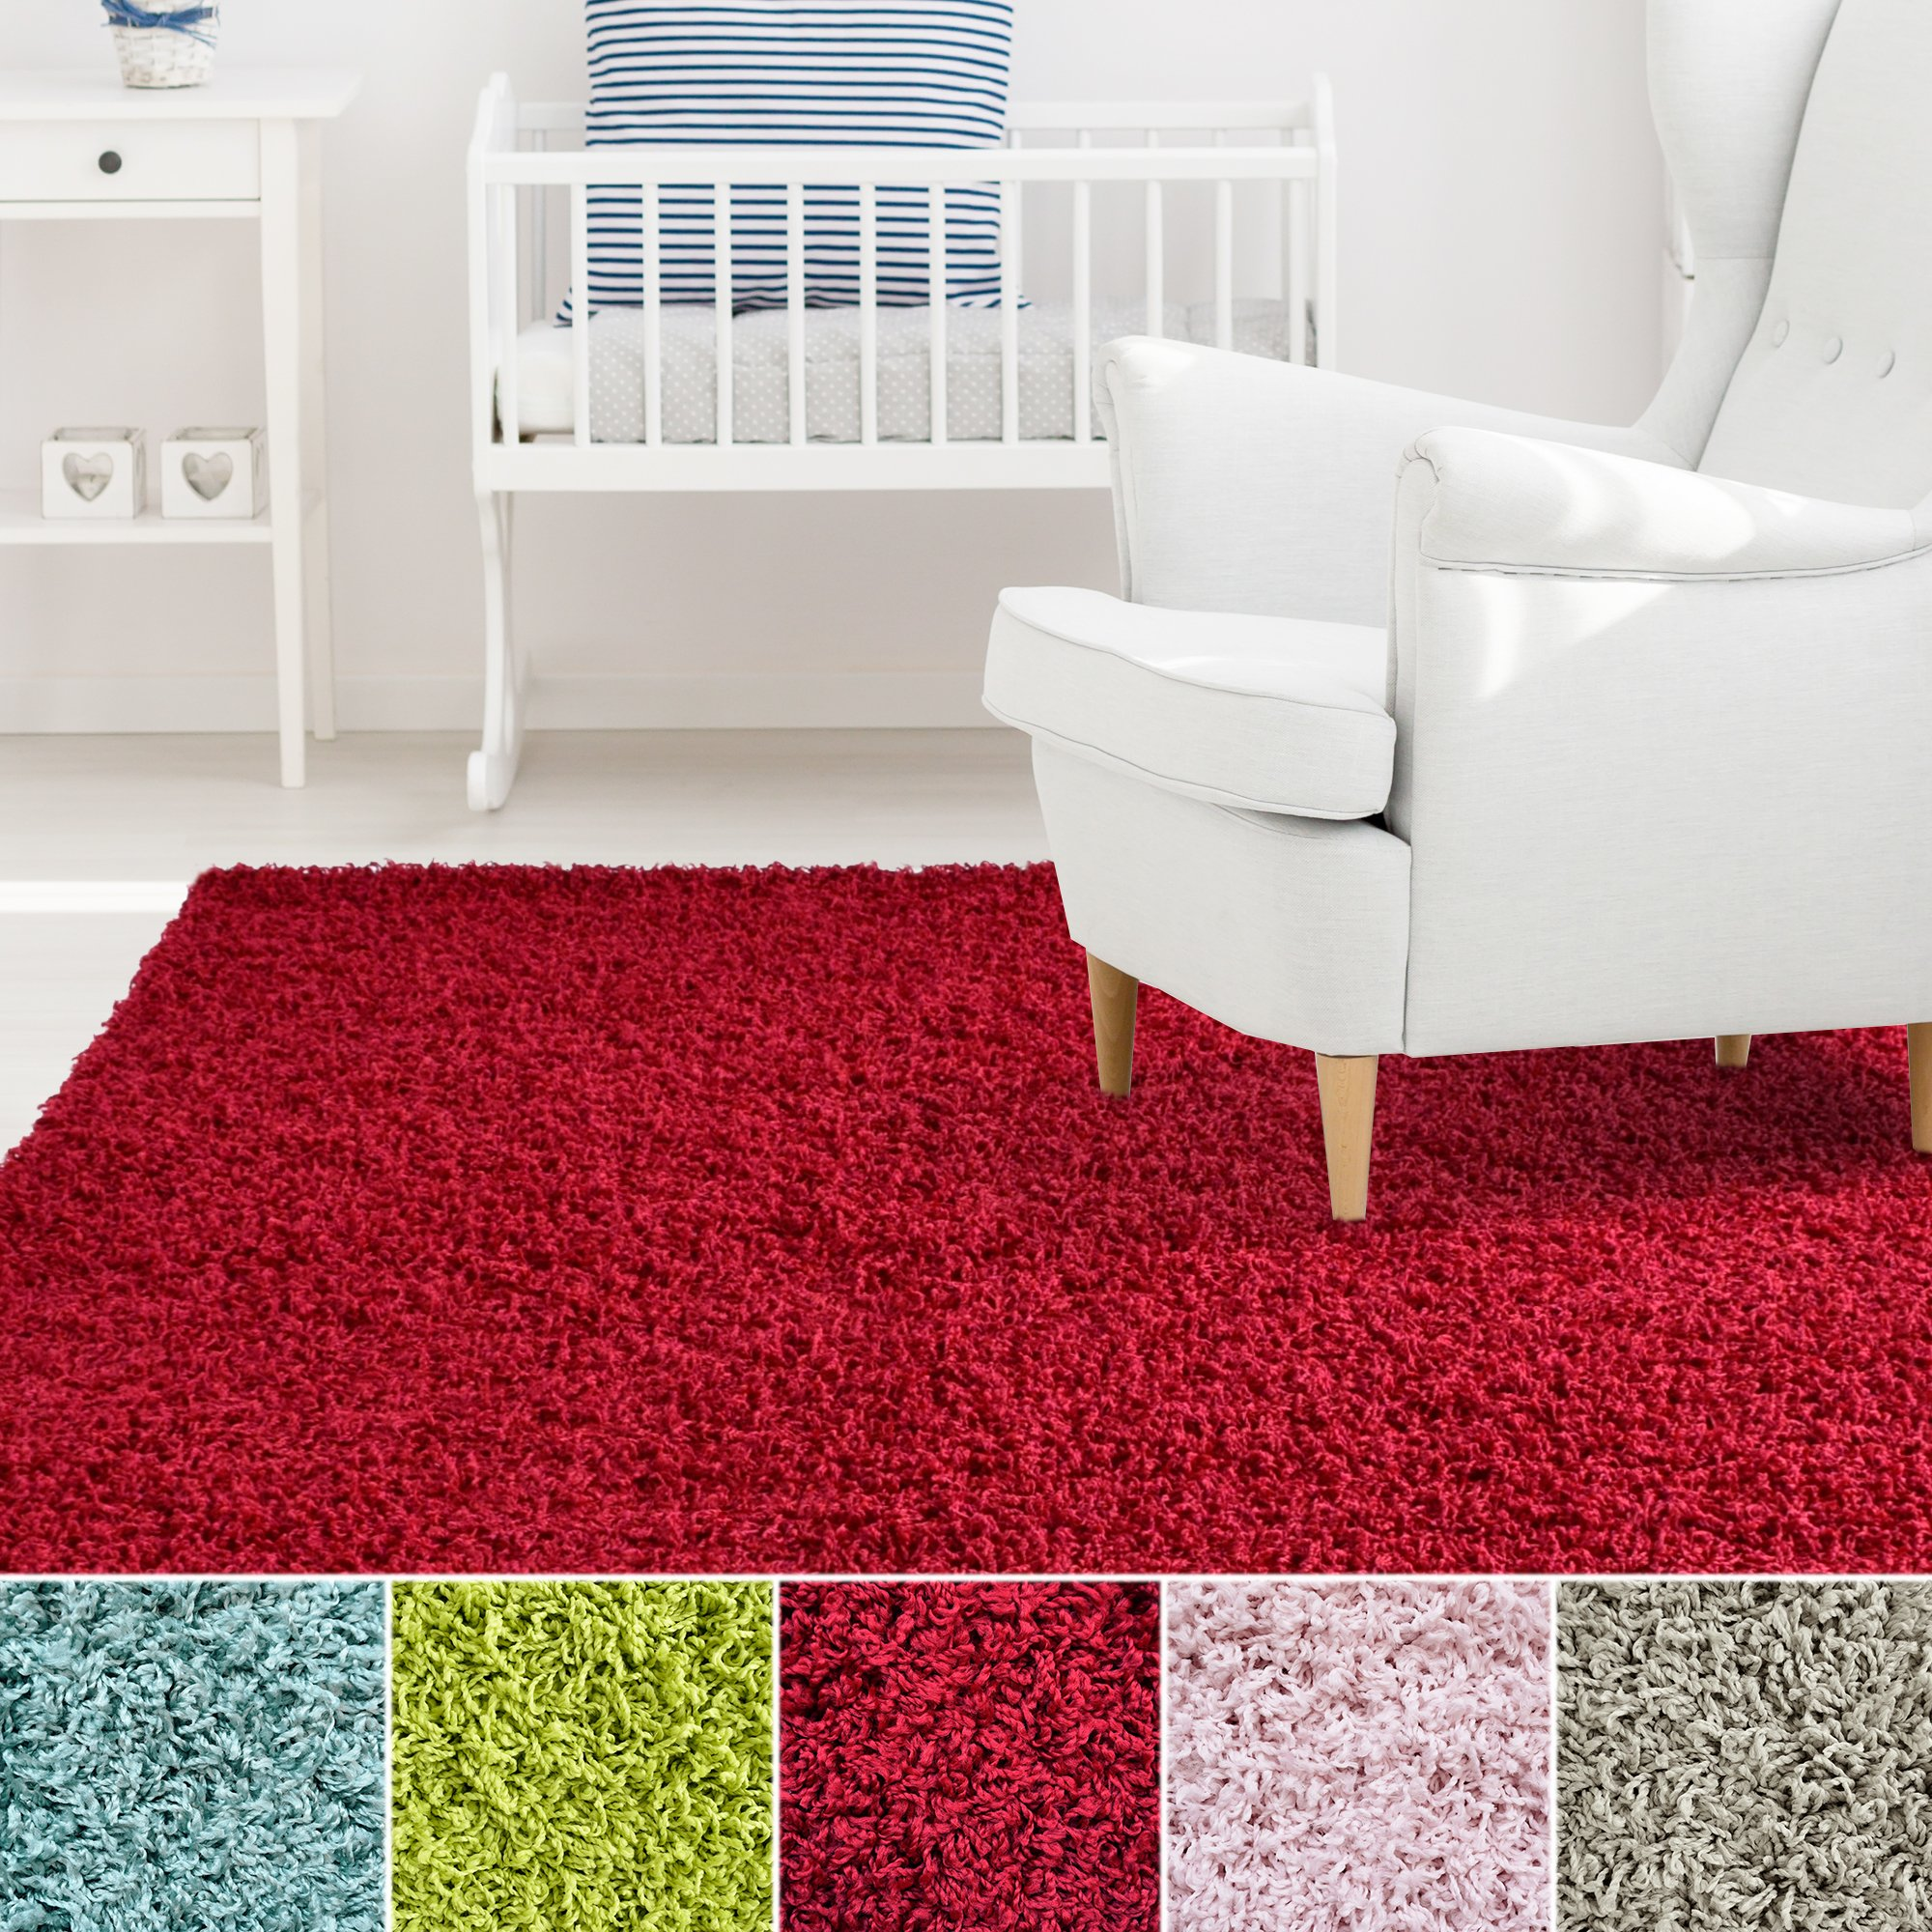 iCustomRug Affordable Shaggy Rug Dixie Cozy & Soft Kids Shag Area Rug Solid Color Red, For Children's Play Area, Bedroom or Nursery Carpet 6 Feet x 9 Feet (6' x 9')